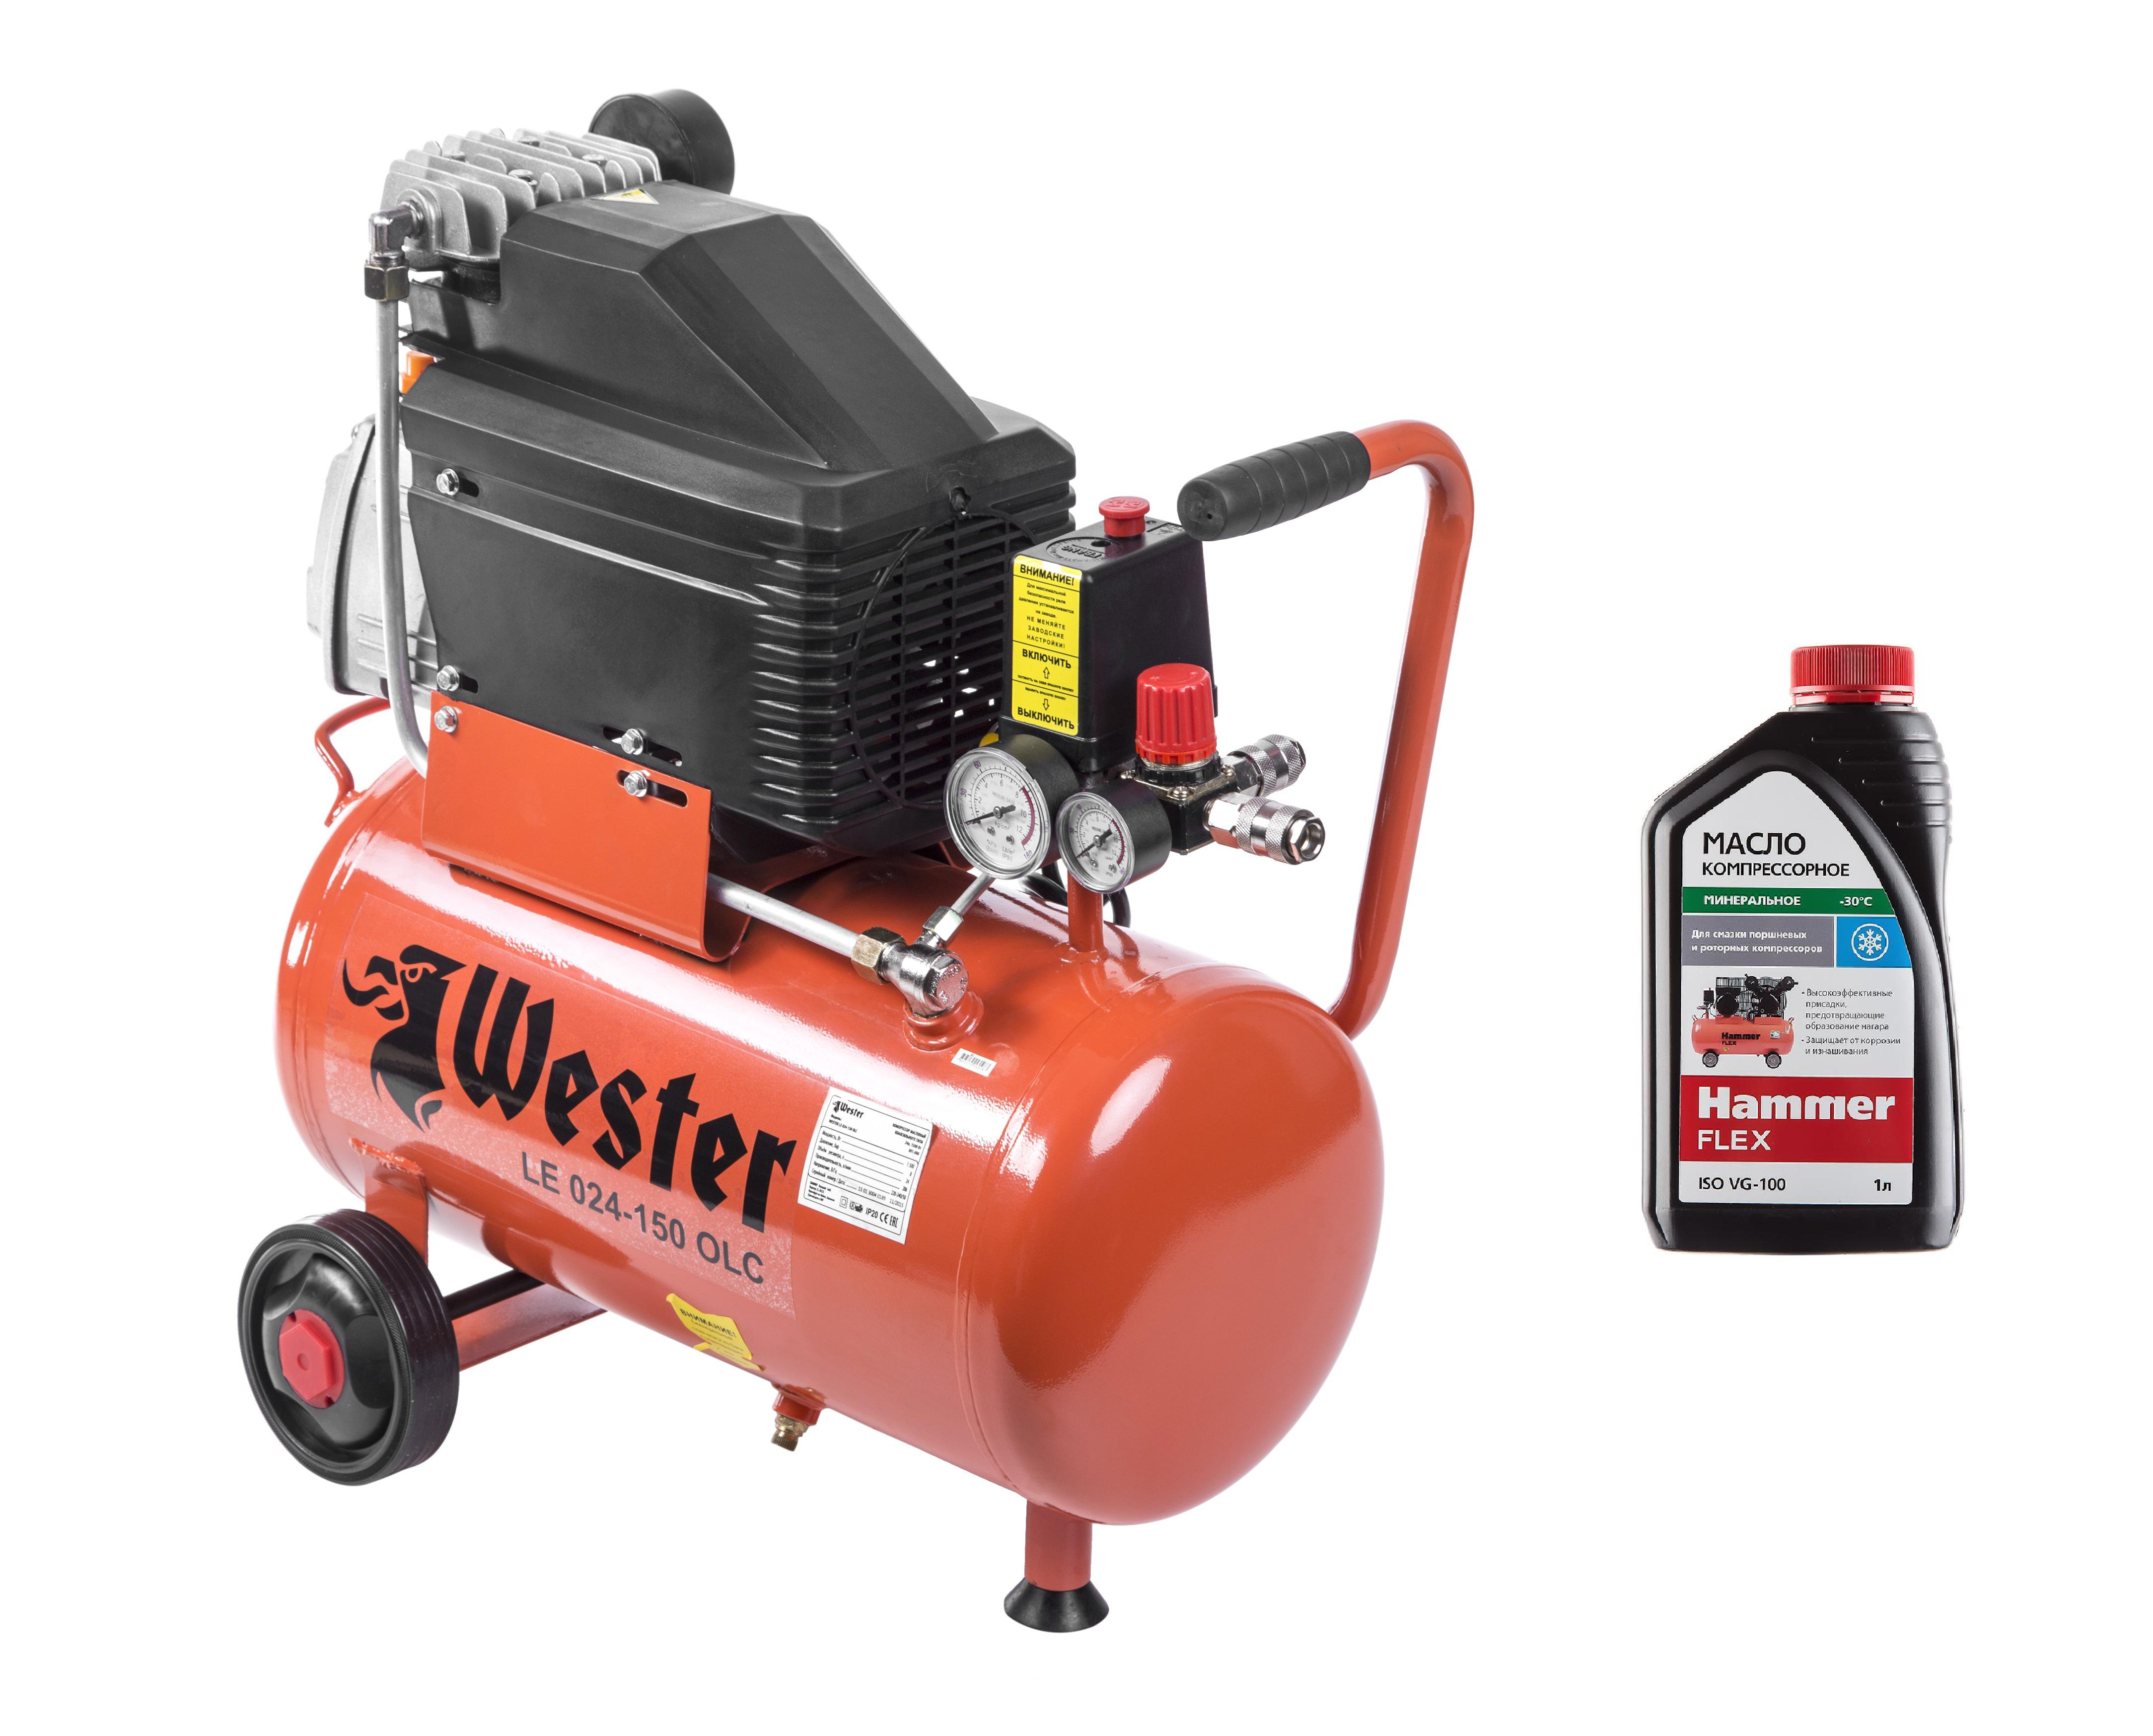 Набор Wester Компрессор le 024-150 olc +Масло компрессорное 501-012